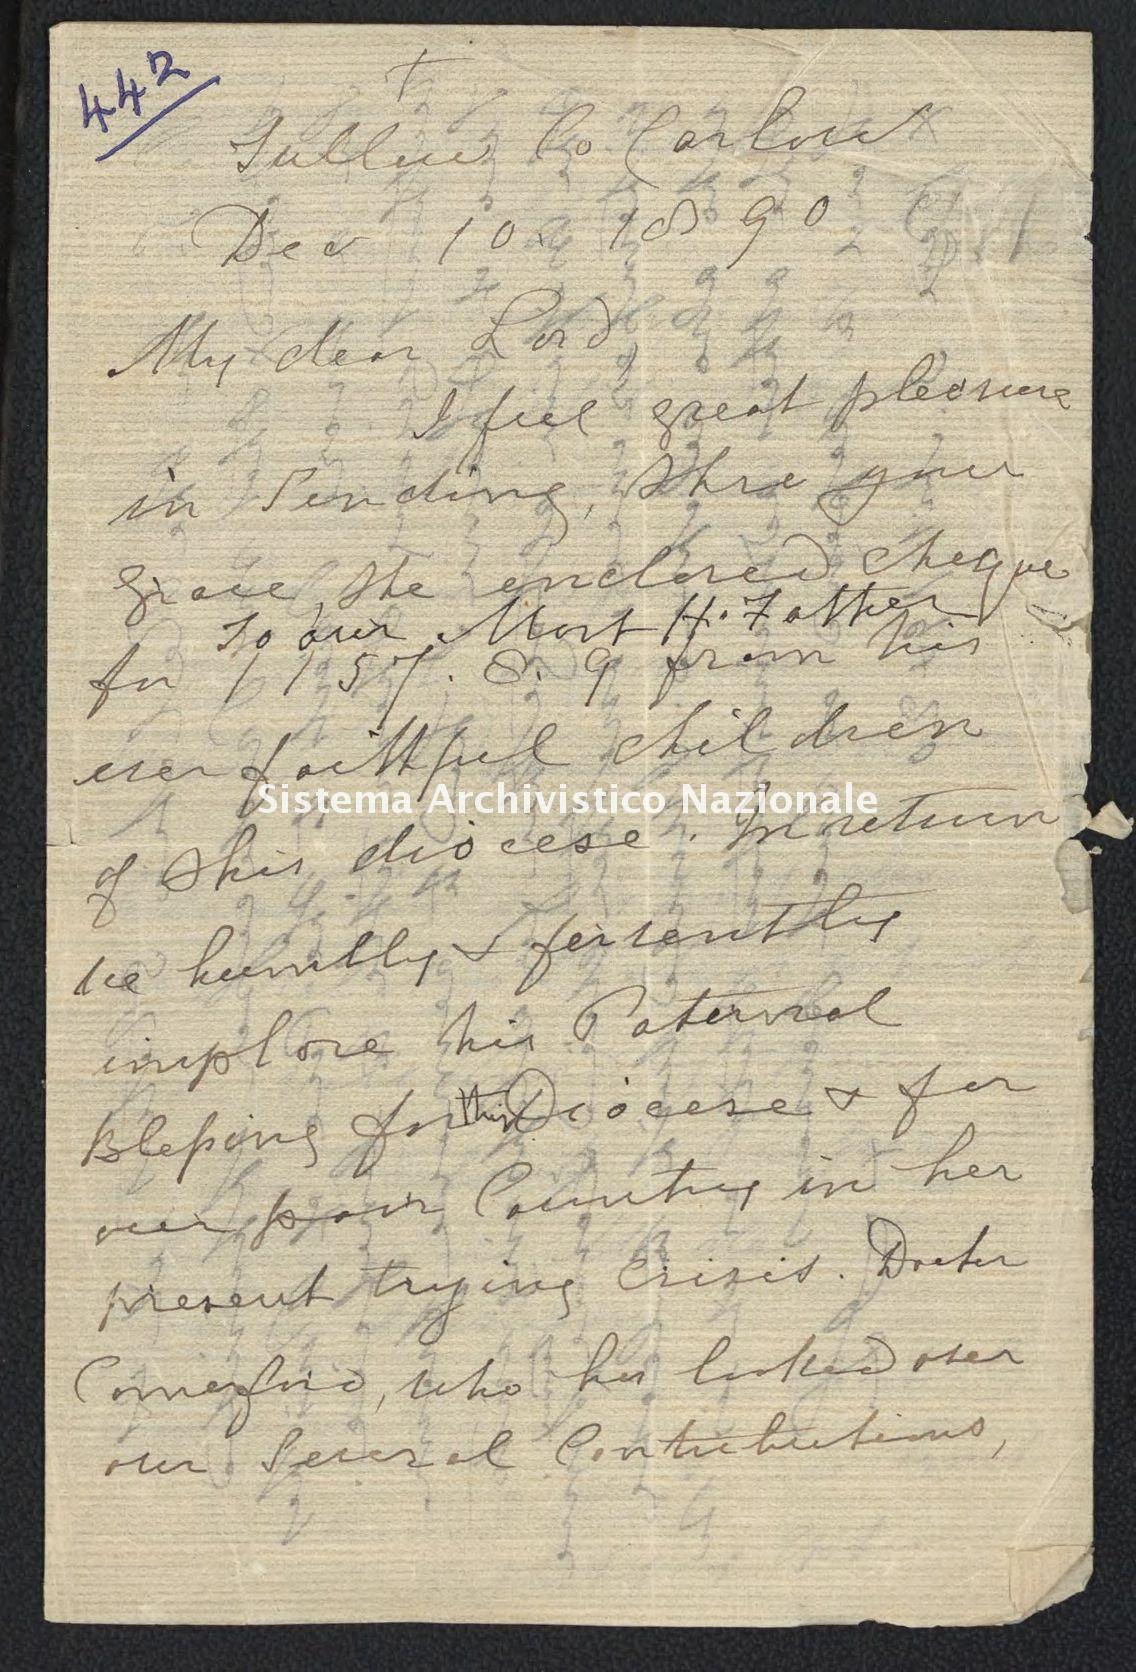 Pontificio Collegio Irlandese - Kirby_1890_442